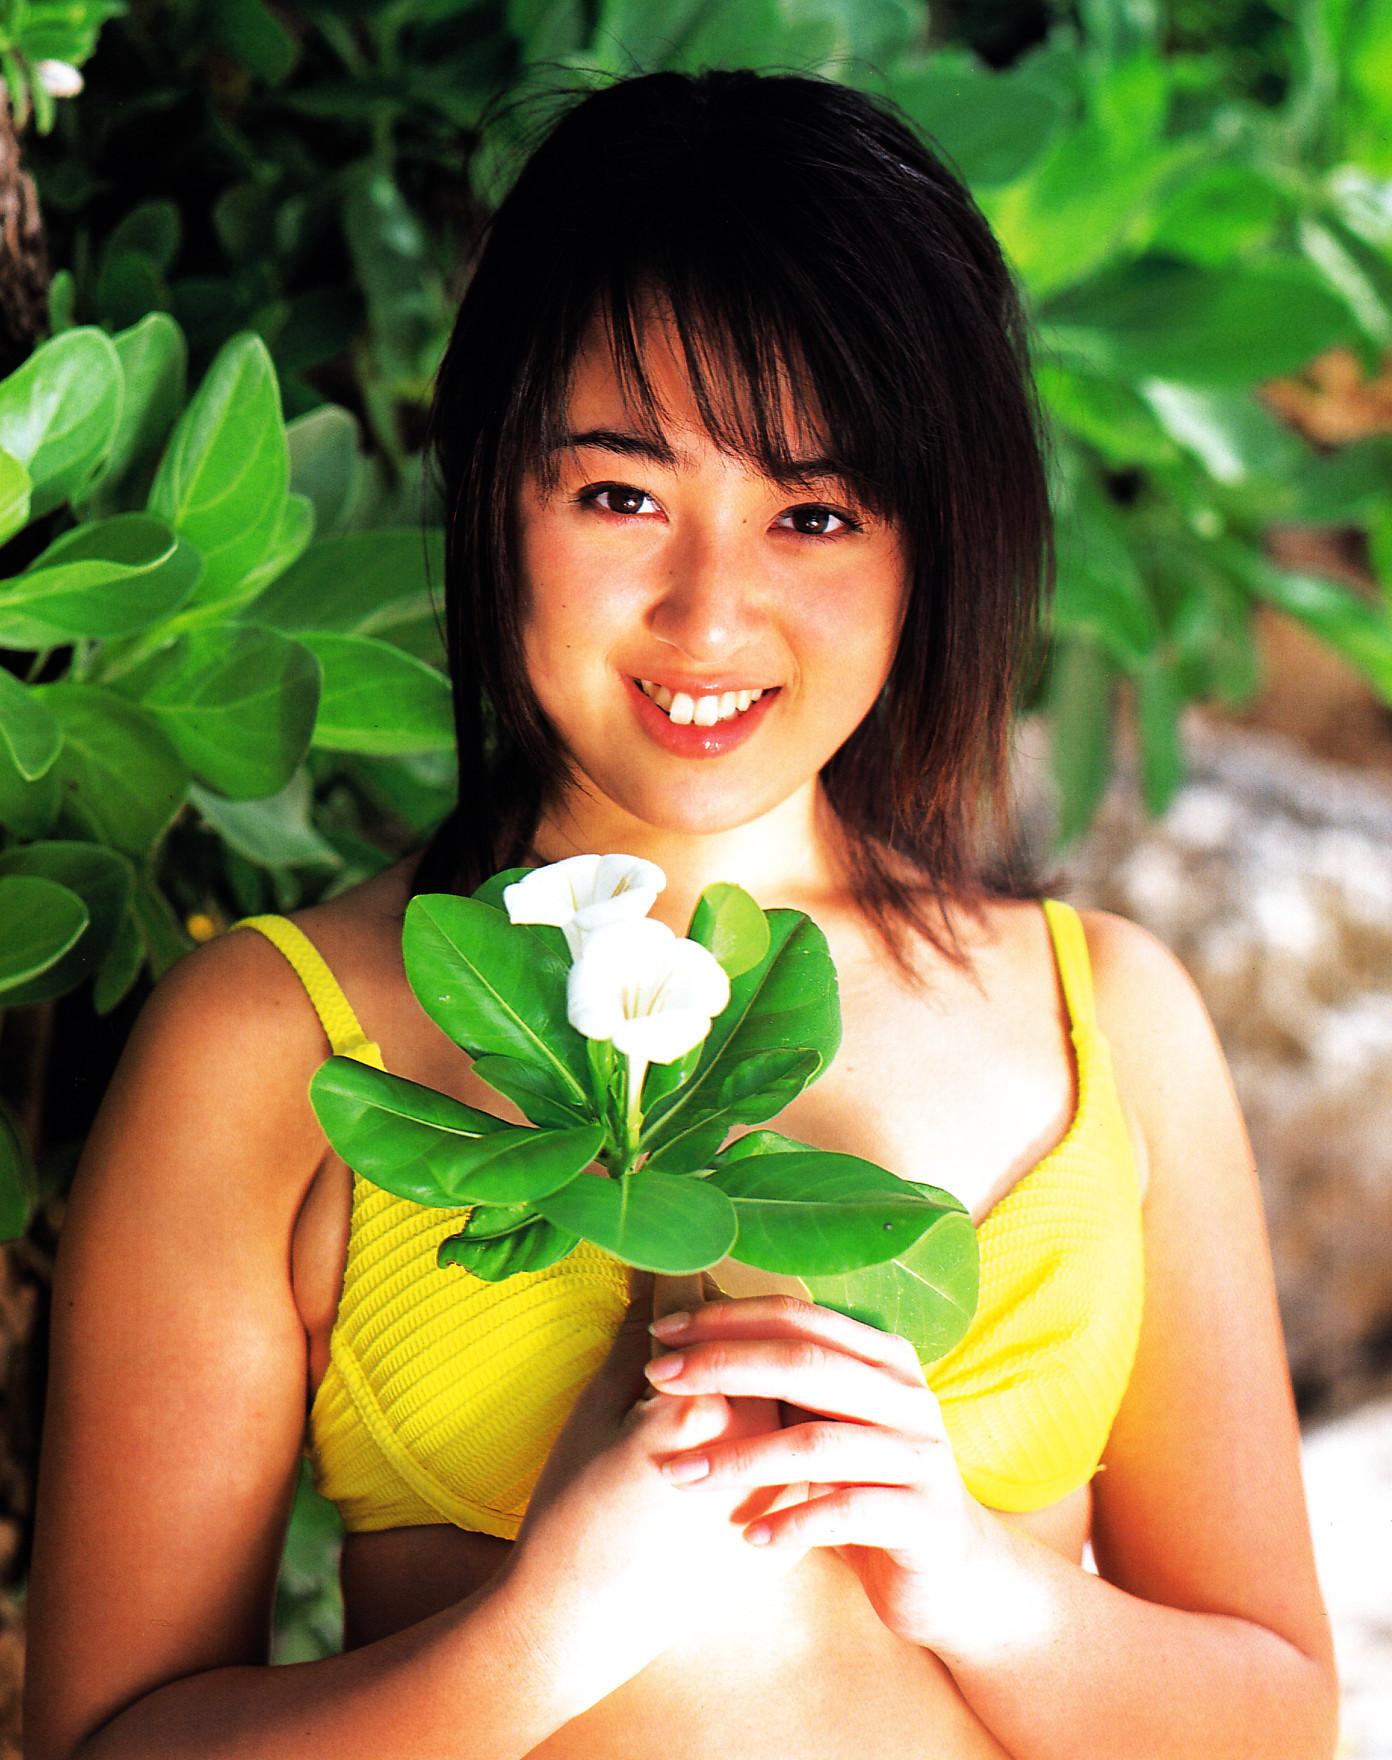 宮澤寿梨の画像 p1_17